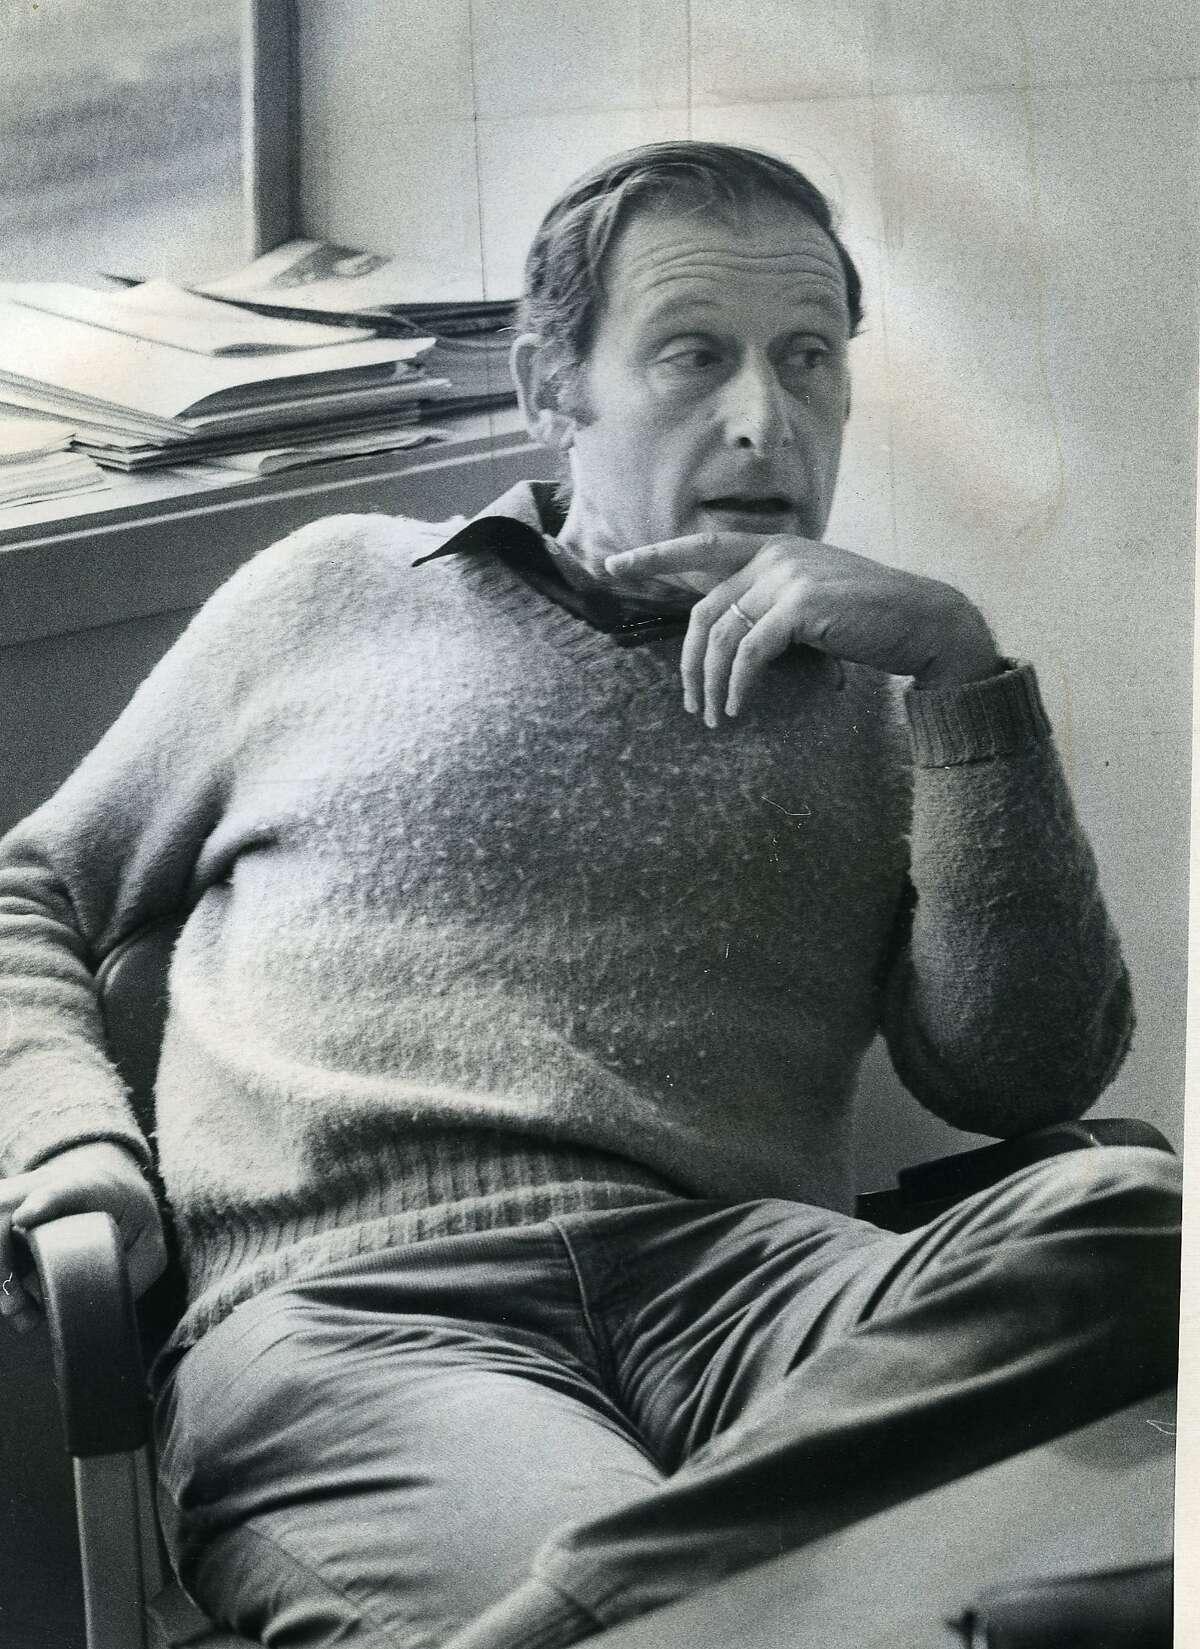 Eric Solomon, Professor of English at San Francisco State February 27, 1975 Photo ran 2/27/1975, p. 2